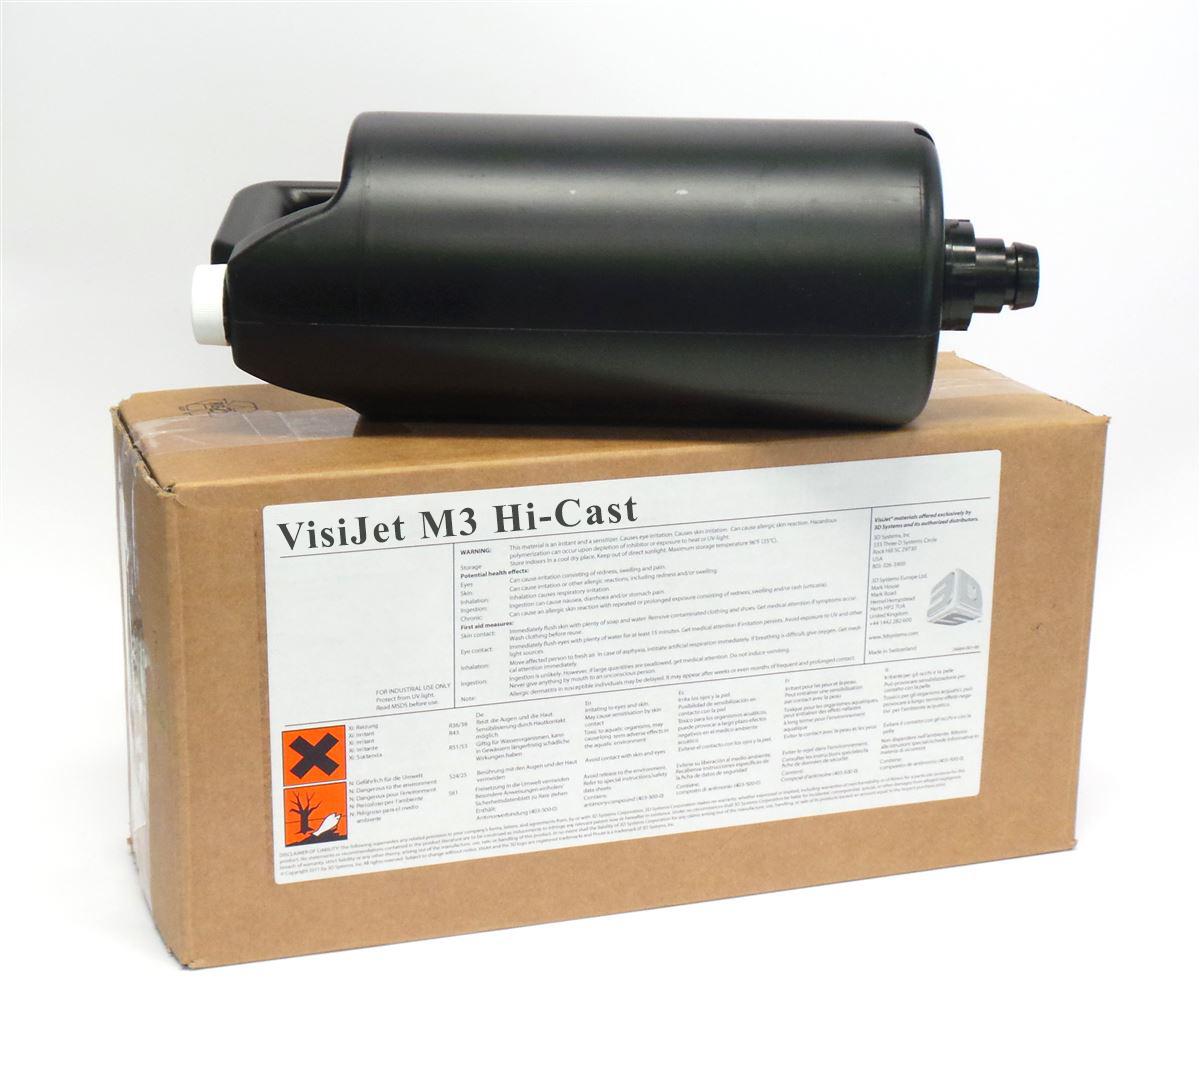 Visijet M3 Hi-Cast MJP3600W & MJP3500W Build